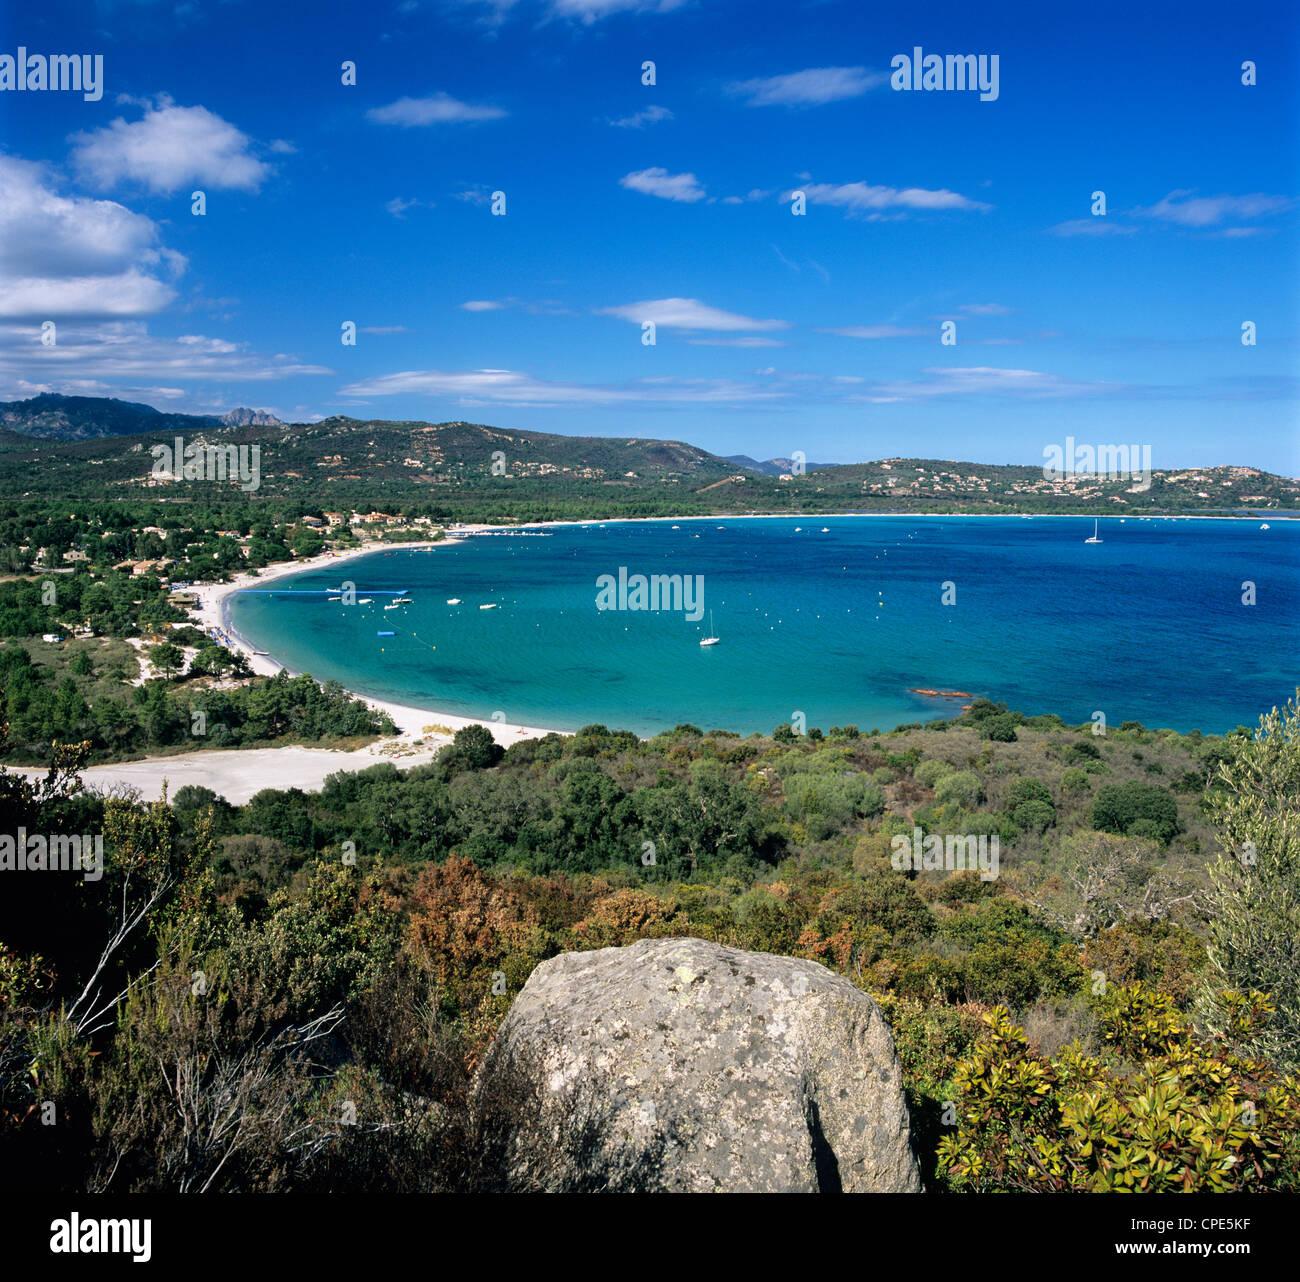 San Ciprianu Beach, Near Porto Vecchio, South East Corsica